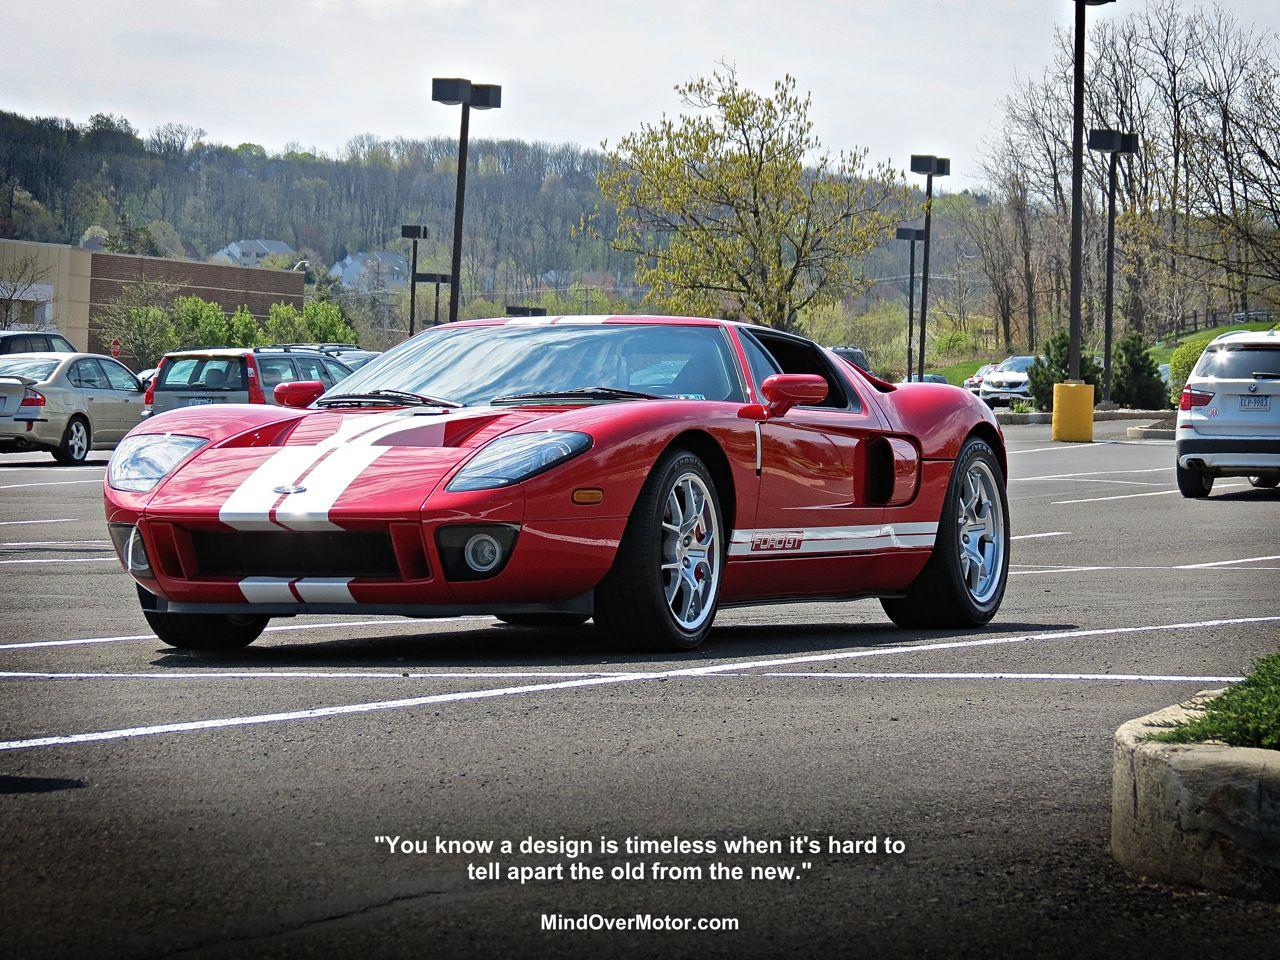 Ford GT at Bucks County Exotics